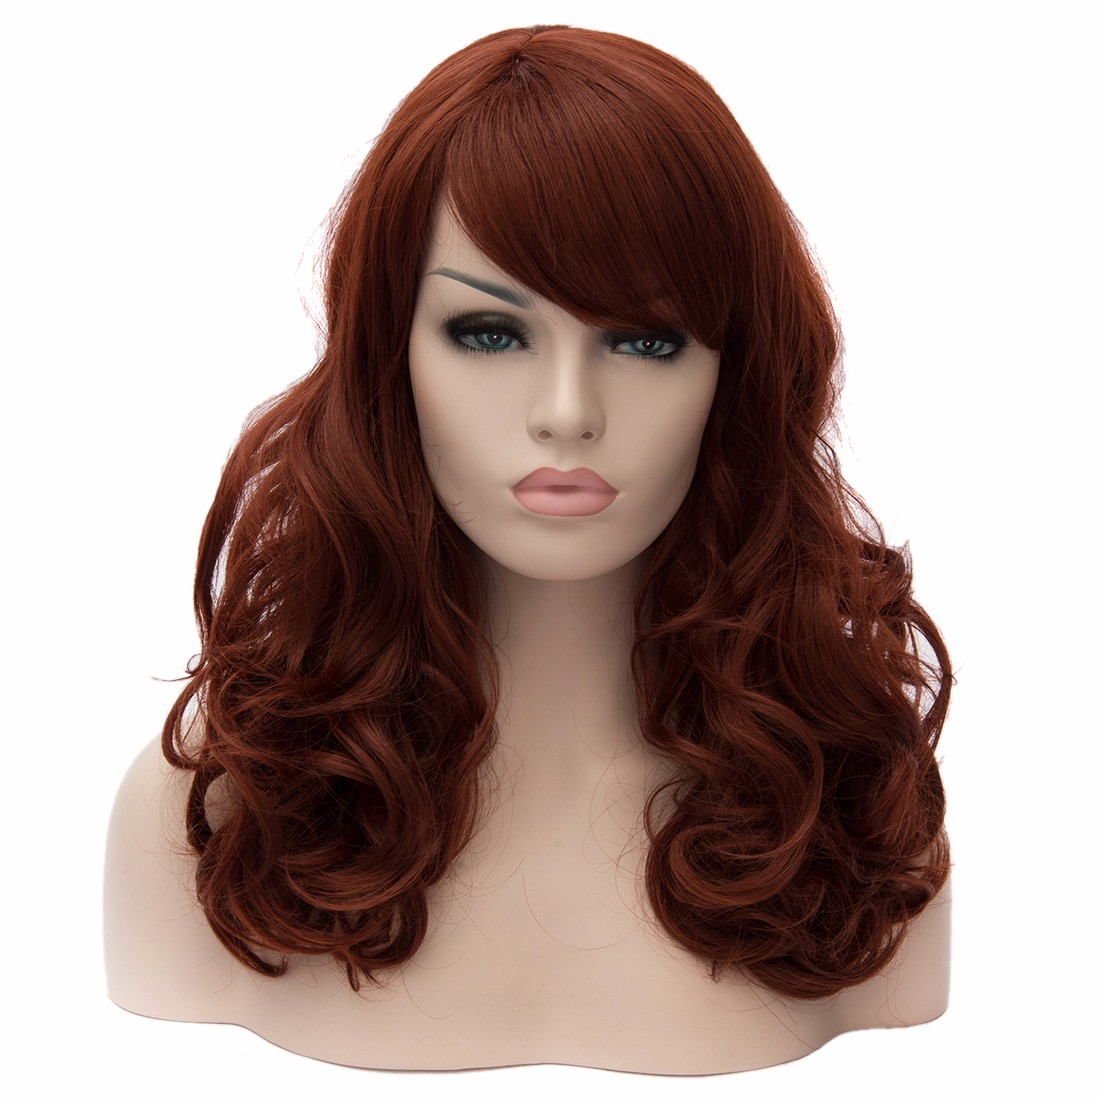 45Cm Rinka Hairdo Women Medium Curly Wave Cosplay Party Full Hair Bangs Wigs